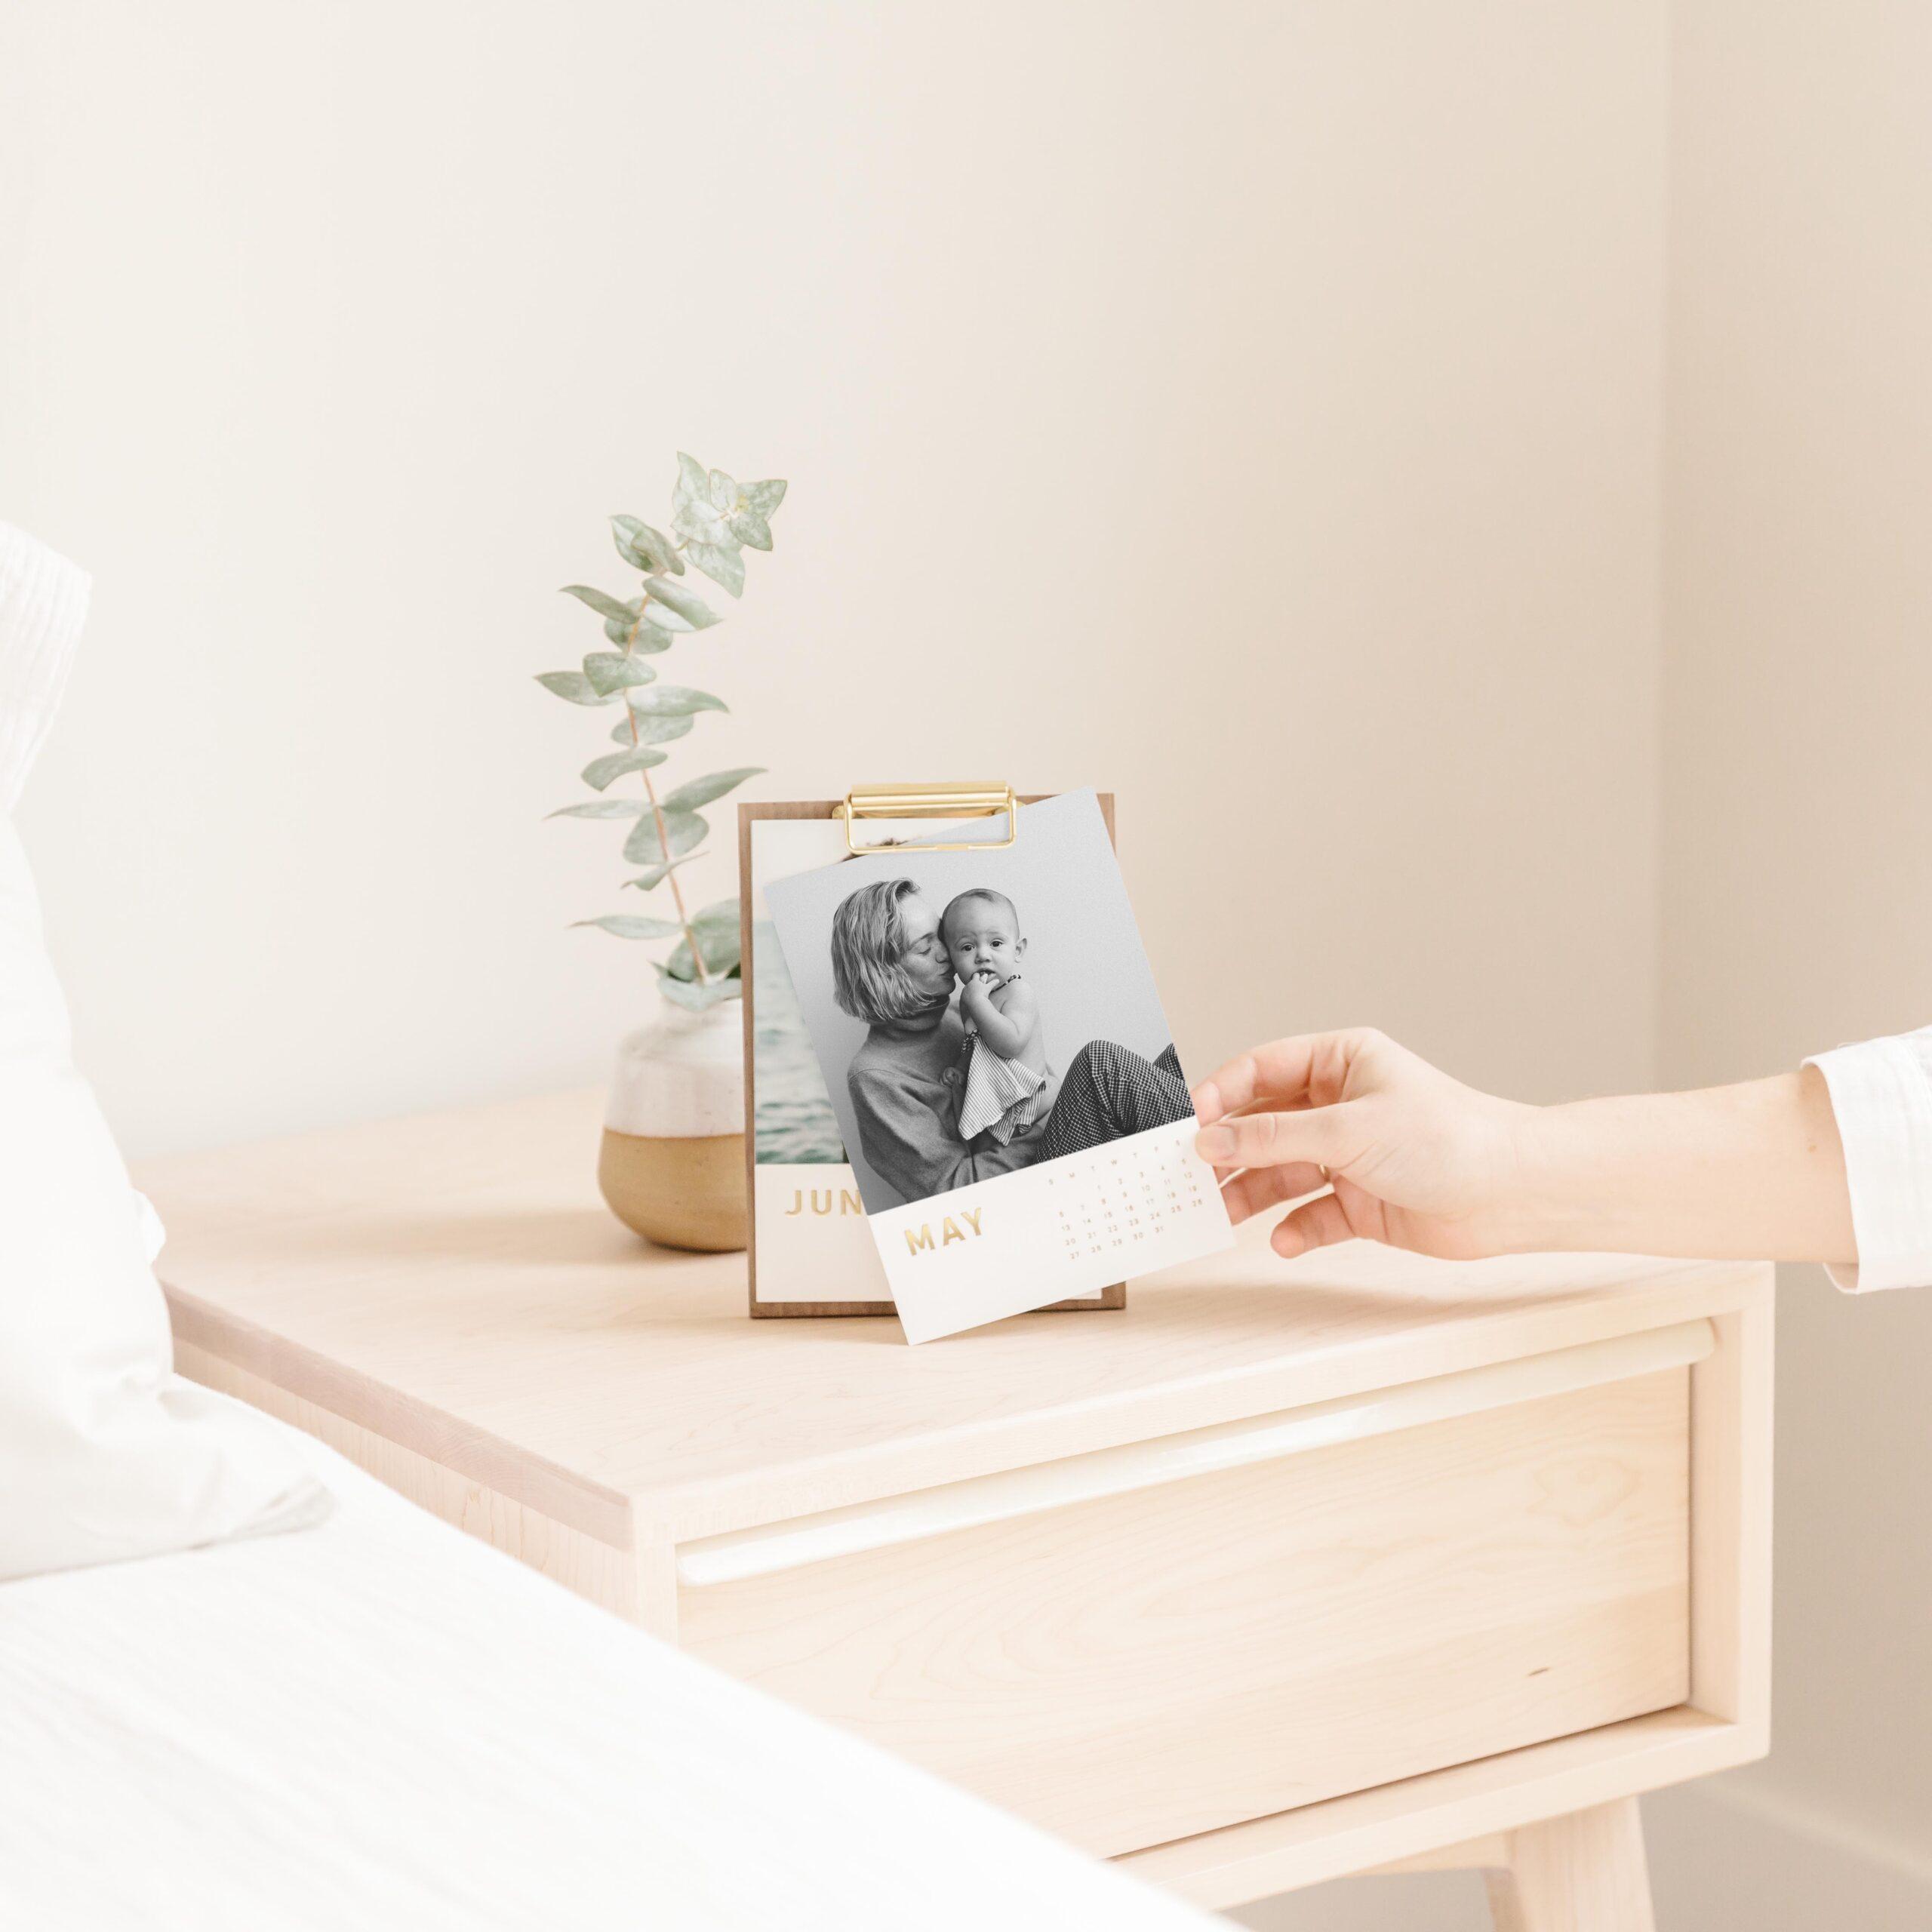 20190321-mothers-day-lifestyle-walnut-calendar-on-nightstand-hand-43